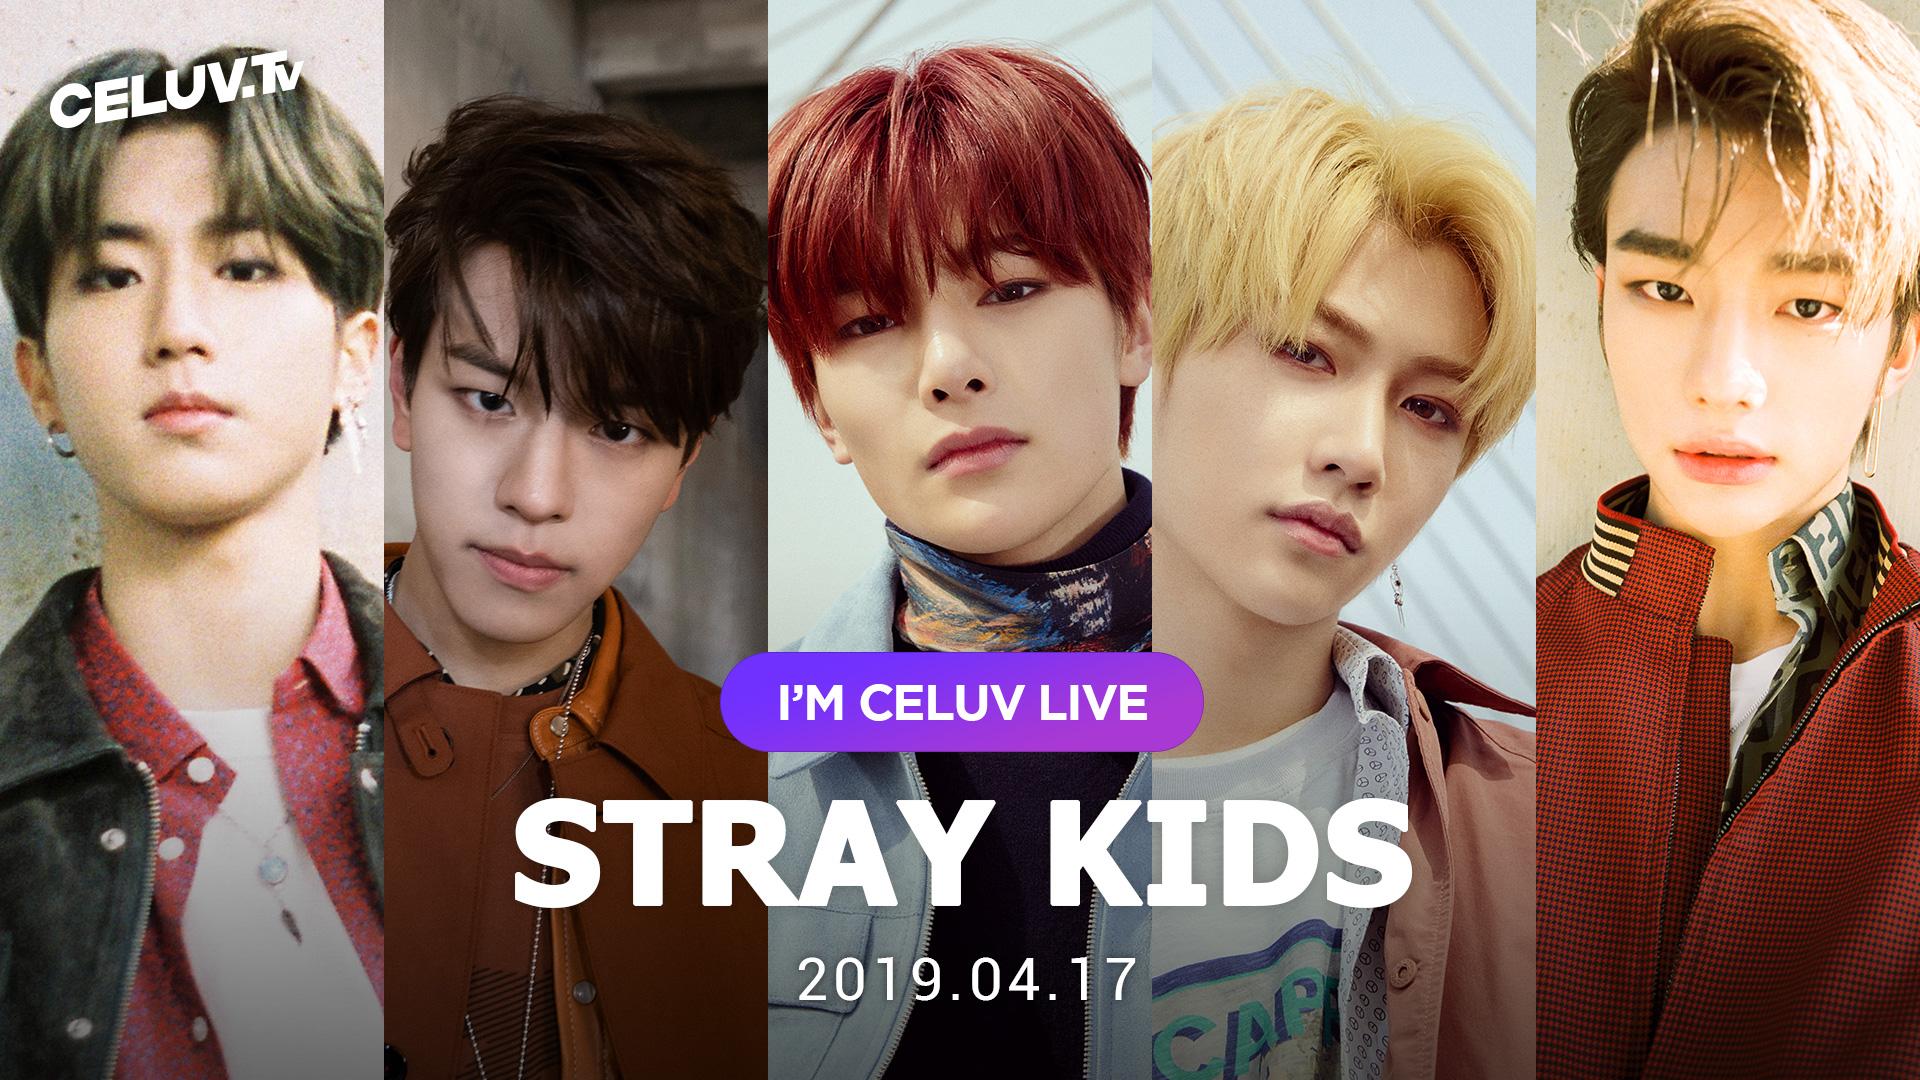 [I'm Celuv] Stray Kids(현진,승민,한,필릭스,아이엔), 패기 넘치는 소년들의 열정으로 (Celuv.TV)